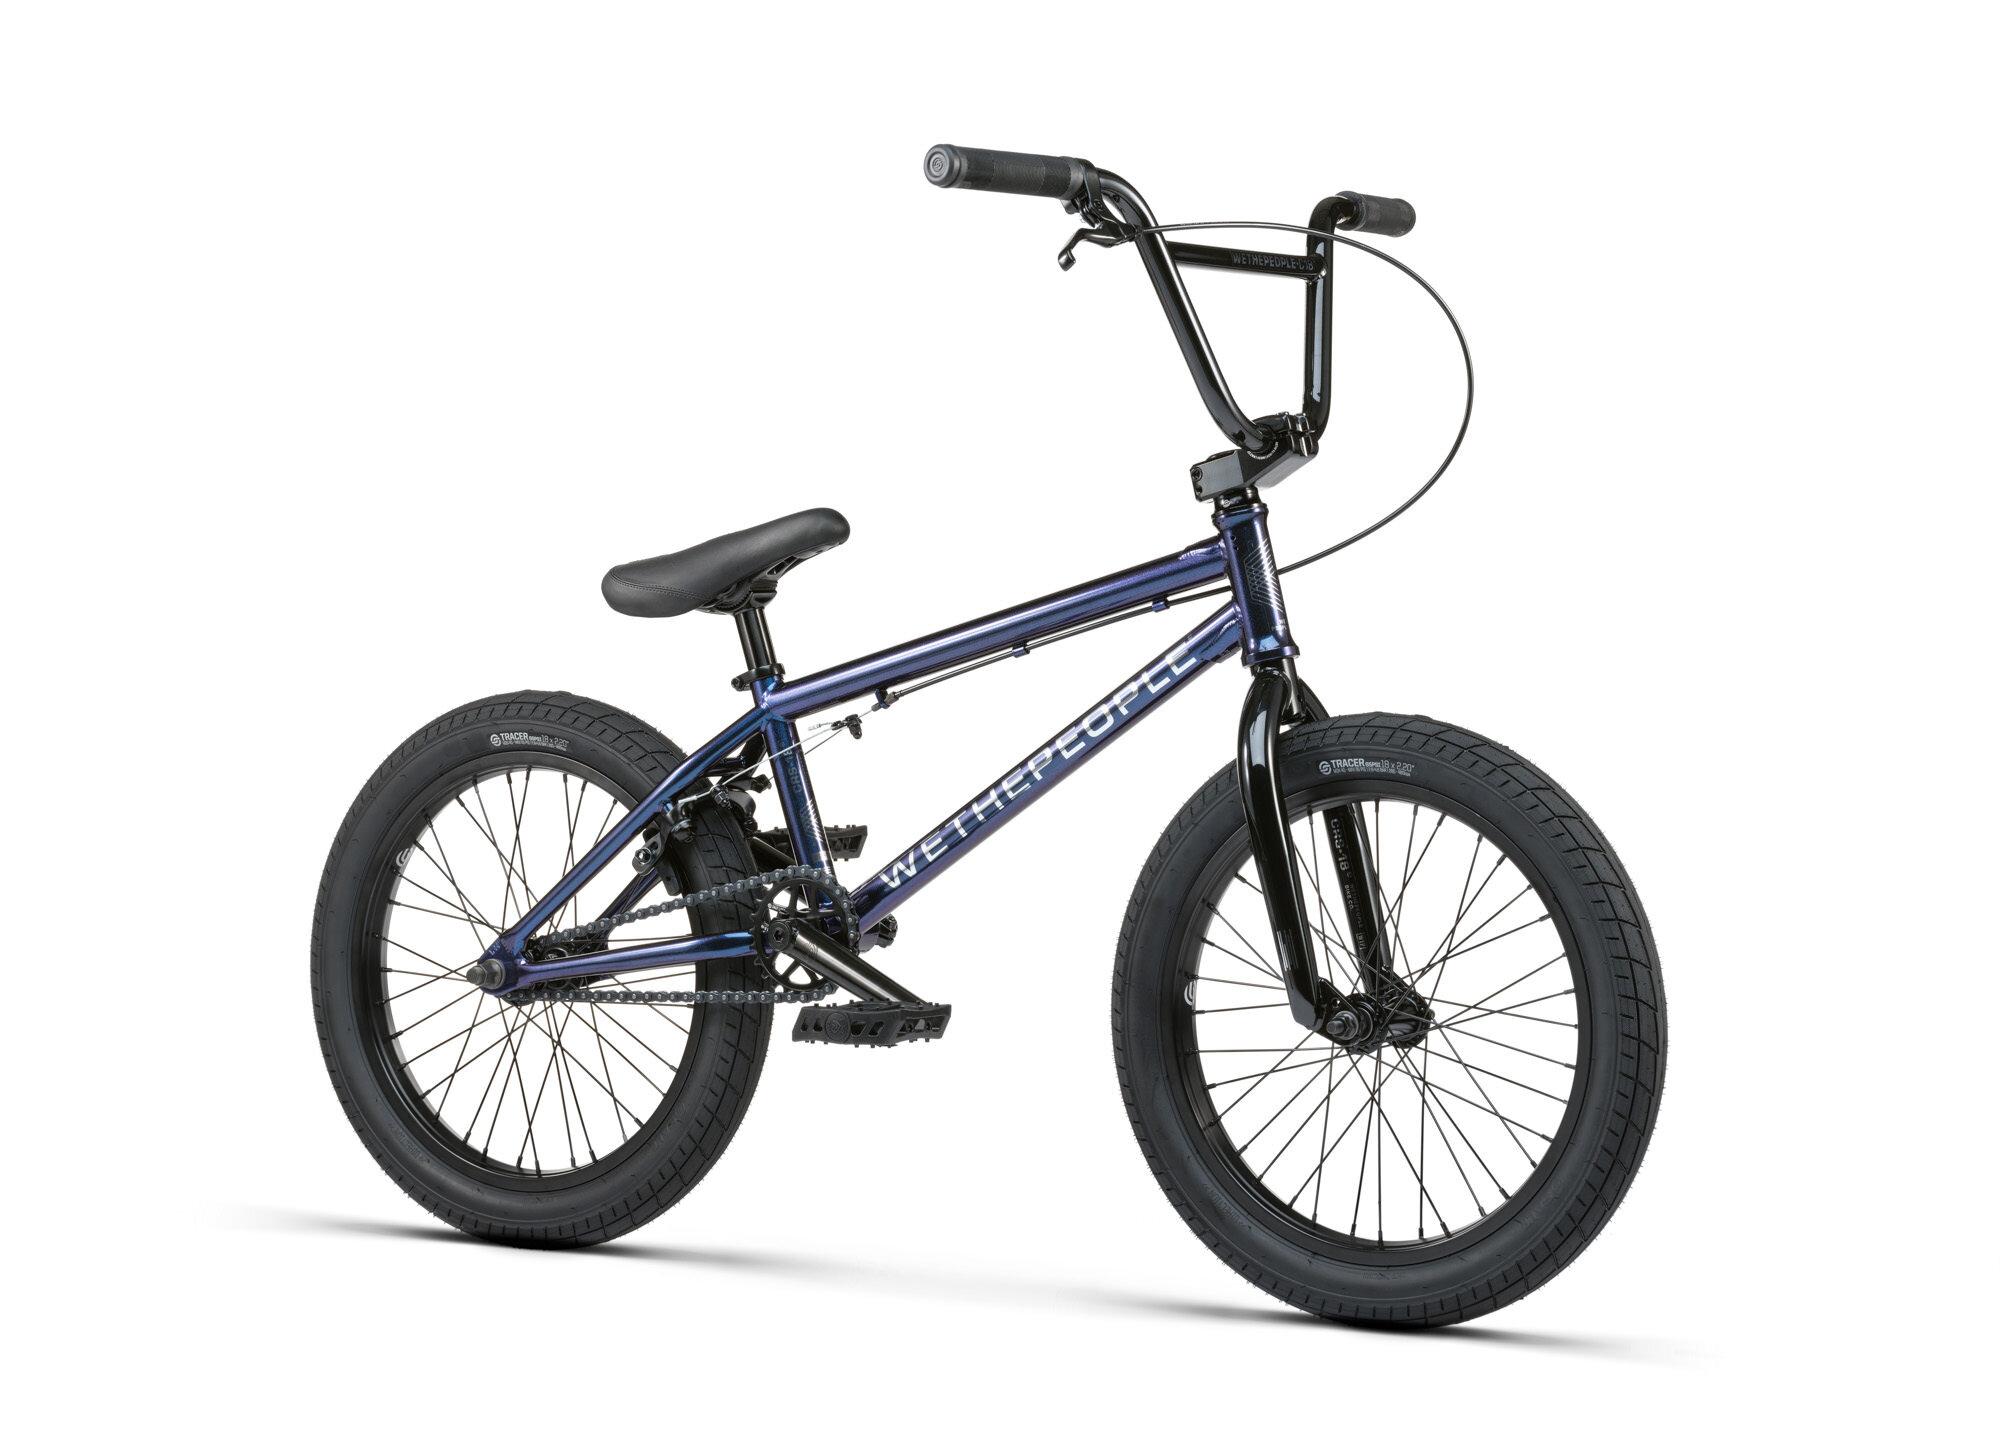 BMX WETHEPEOPLE CRS 18 GALACTIC PURPLE 2021